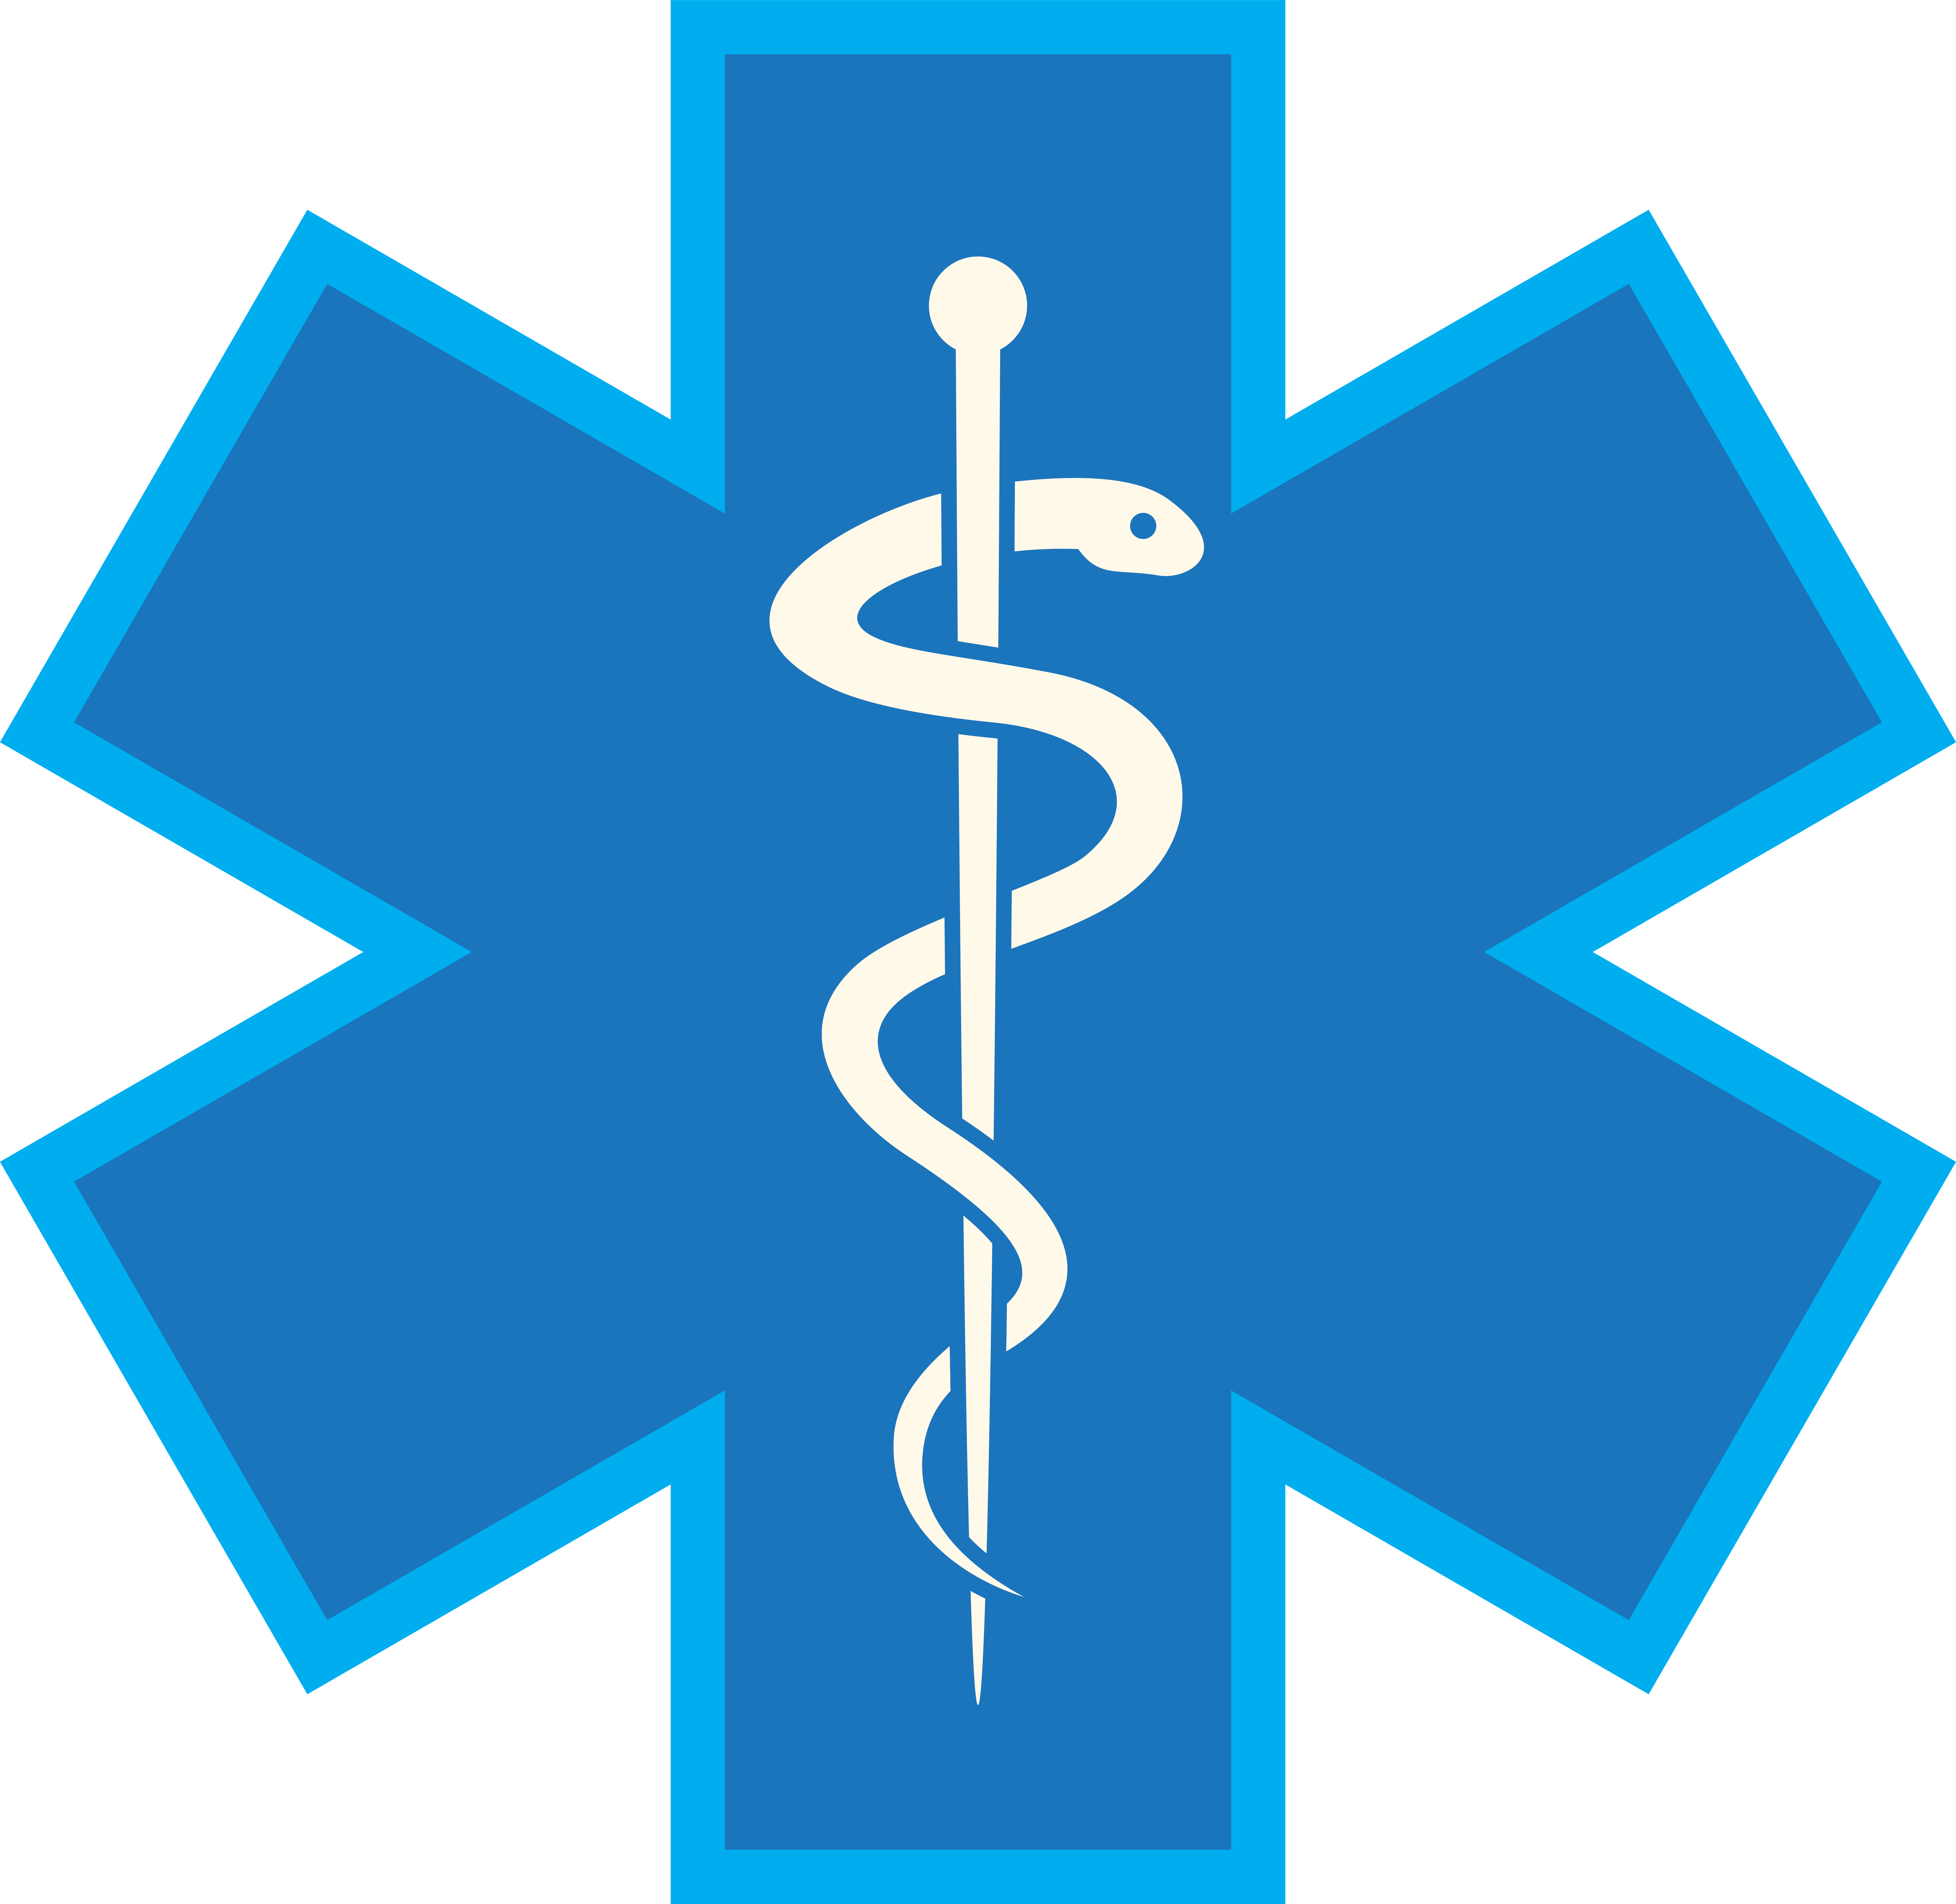 Free Medicare Symbol Cliparts, Download Free Clip Art, Free.